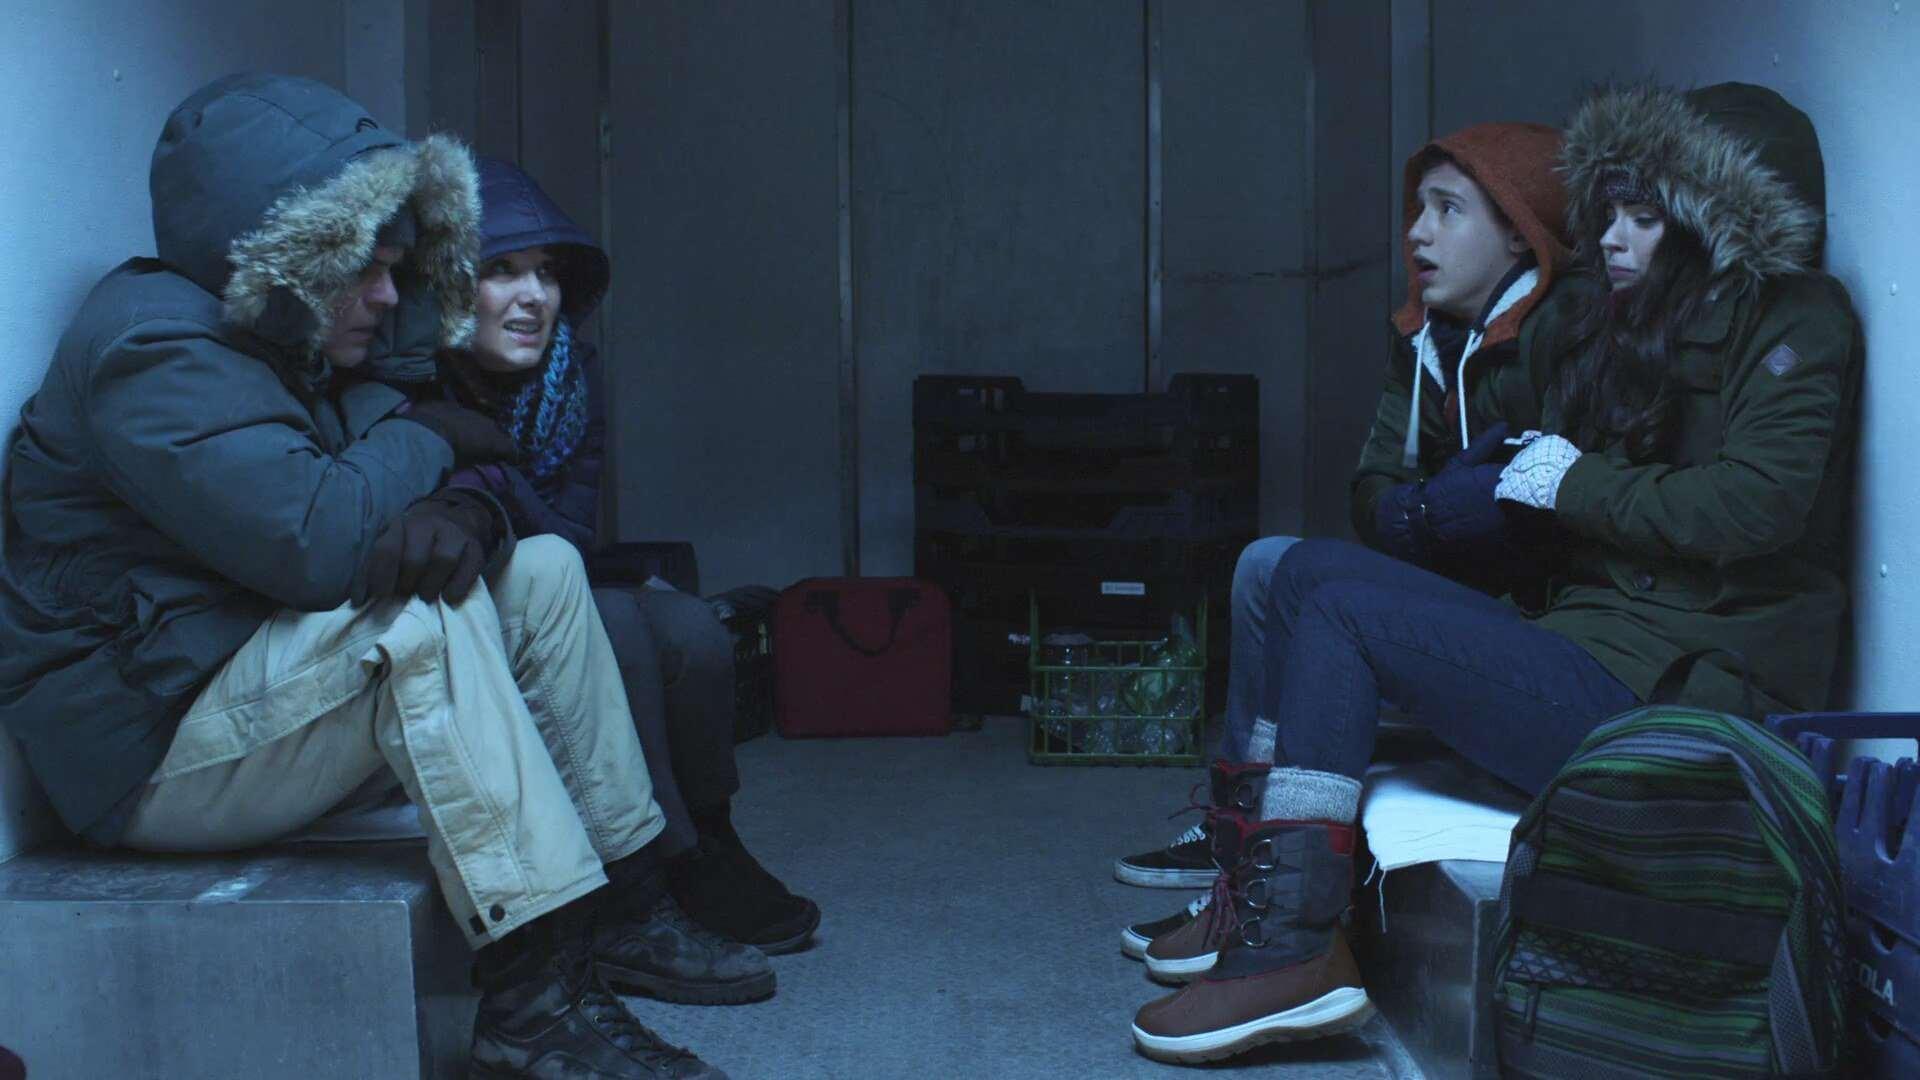 Martin Cummins, Kirsten Robek, Sarah Desjardins, and Nick Purcha in Cold Zone (2017)